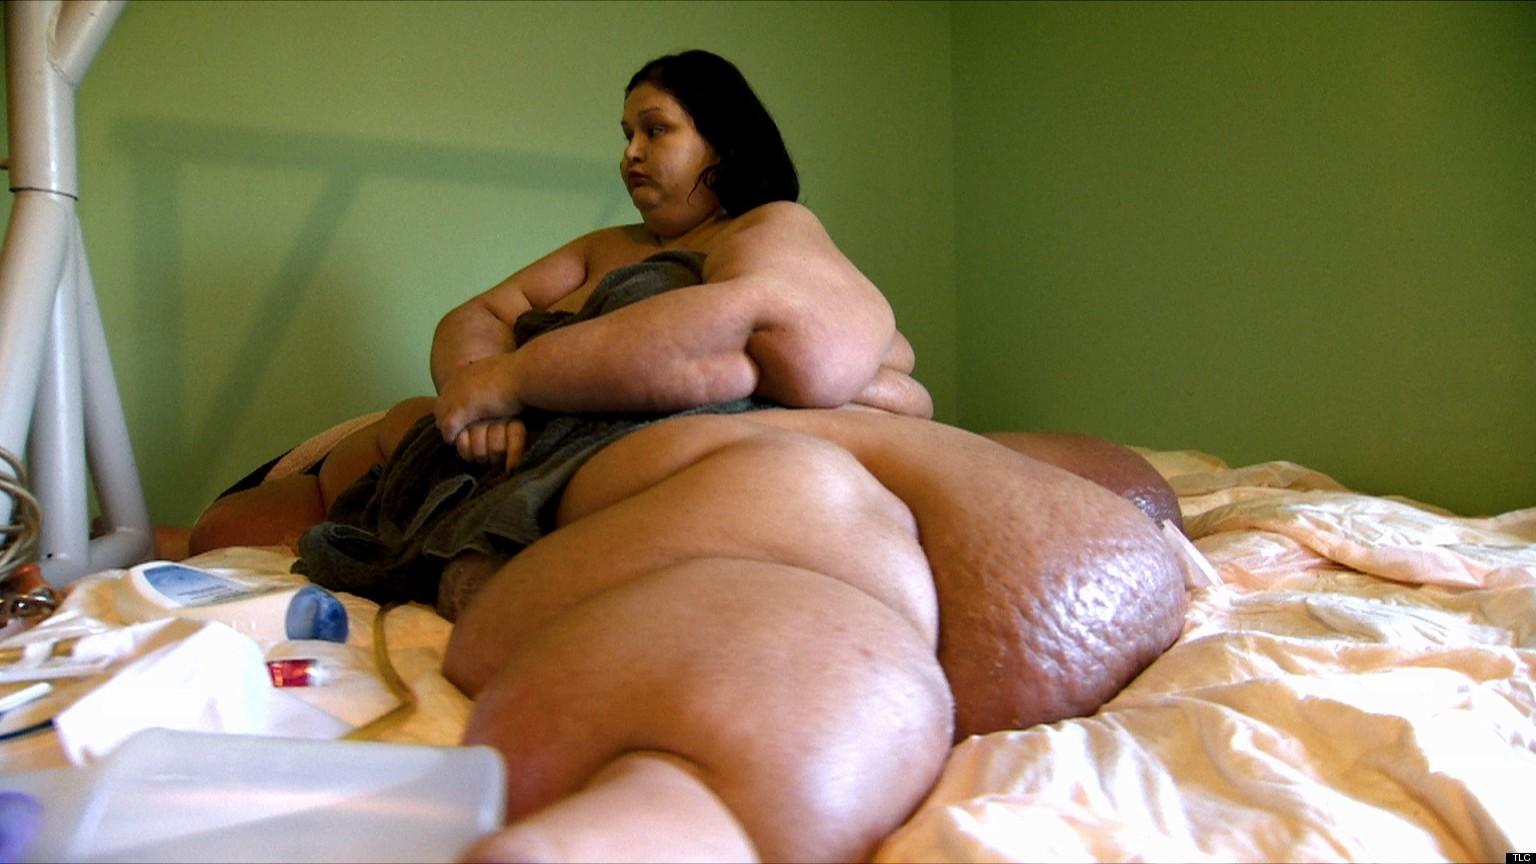 Nude modeling long penis